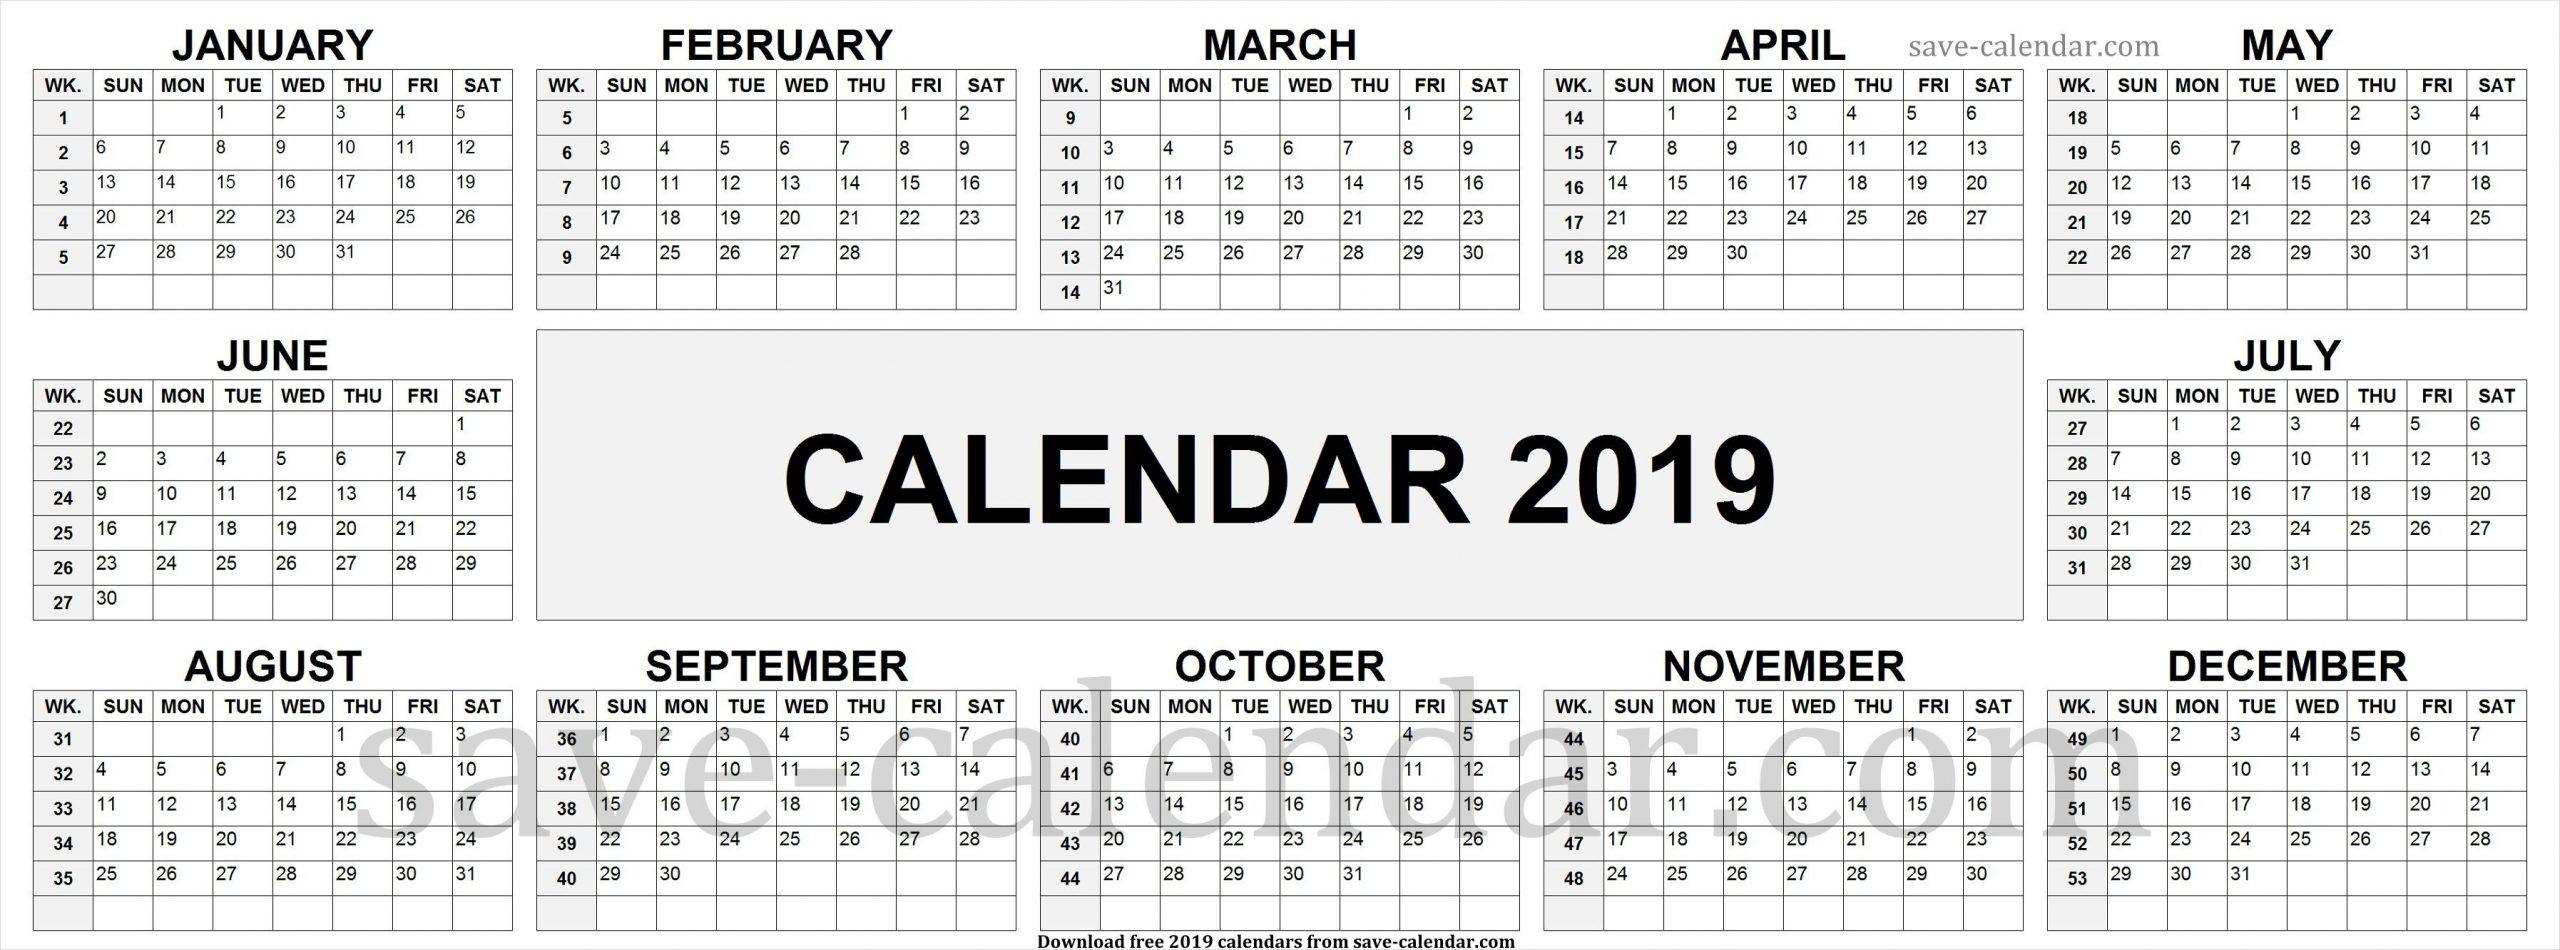 Depo Schedule For 2021 | Calendar Printables Free Blank  Depo-Provera Injection Calendar Printable 2021